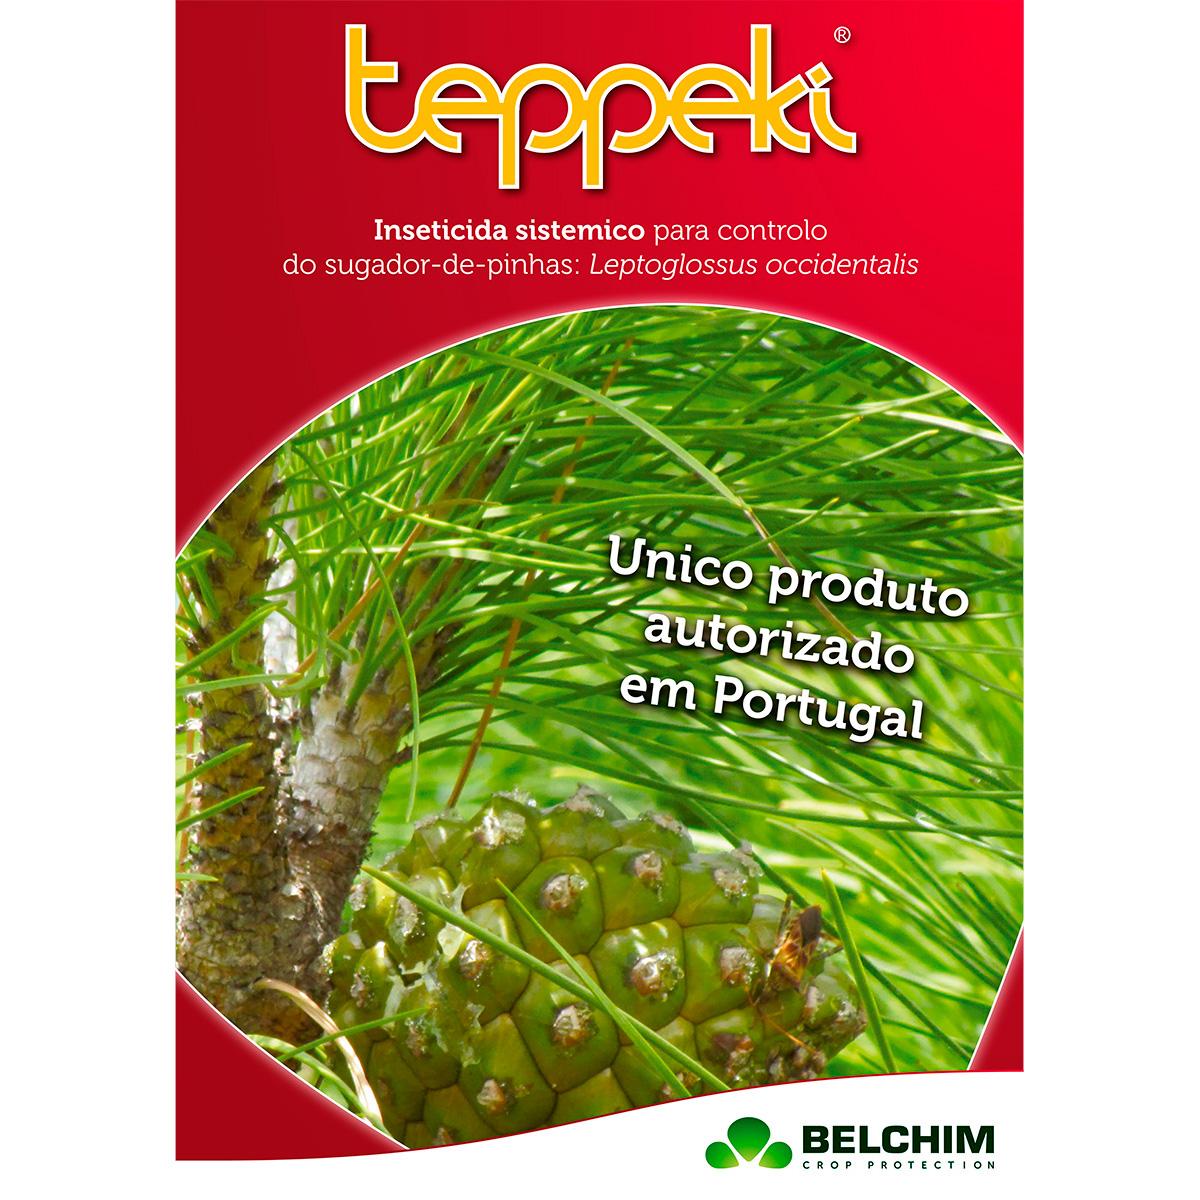 Teppeki514